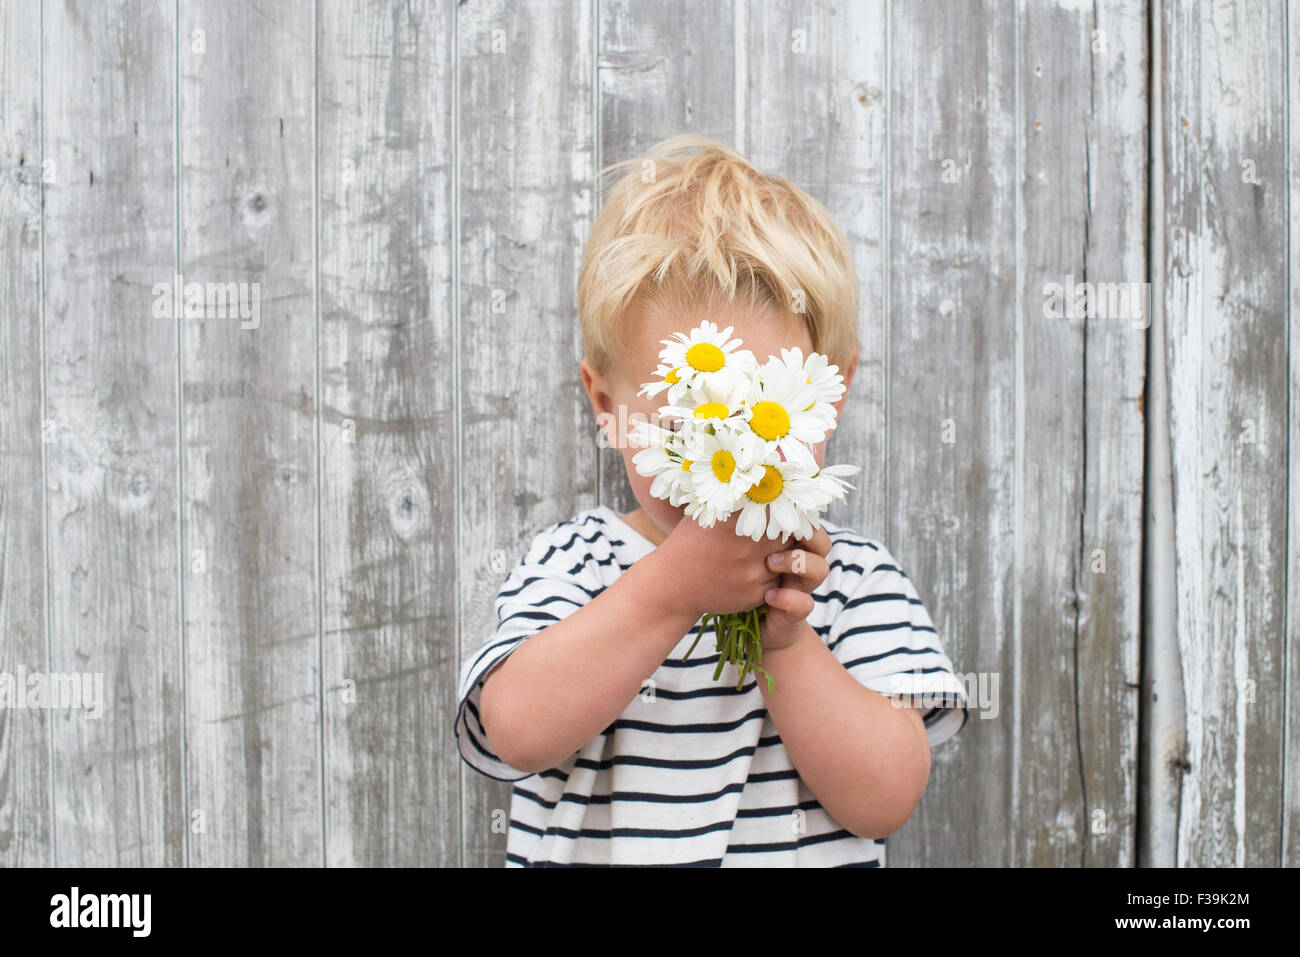 Boy Hiding behind daisies Photo Stock